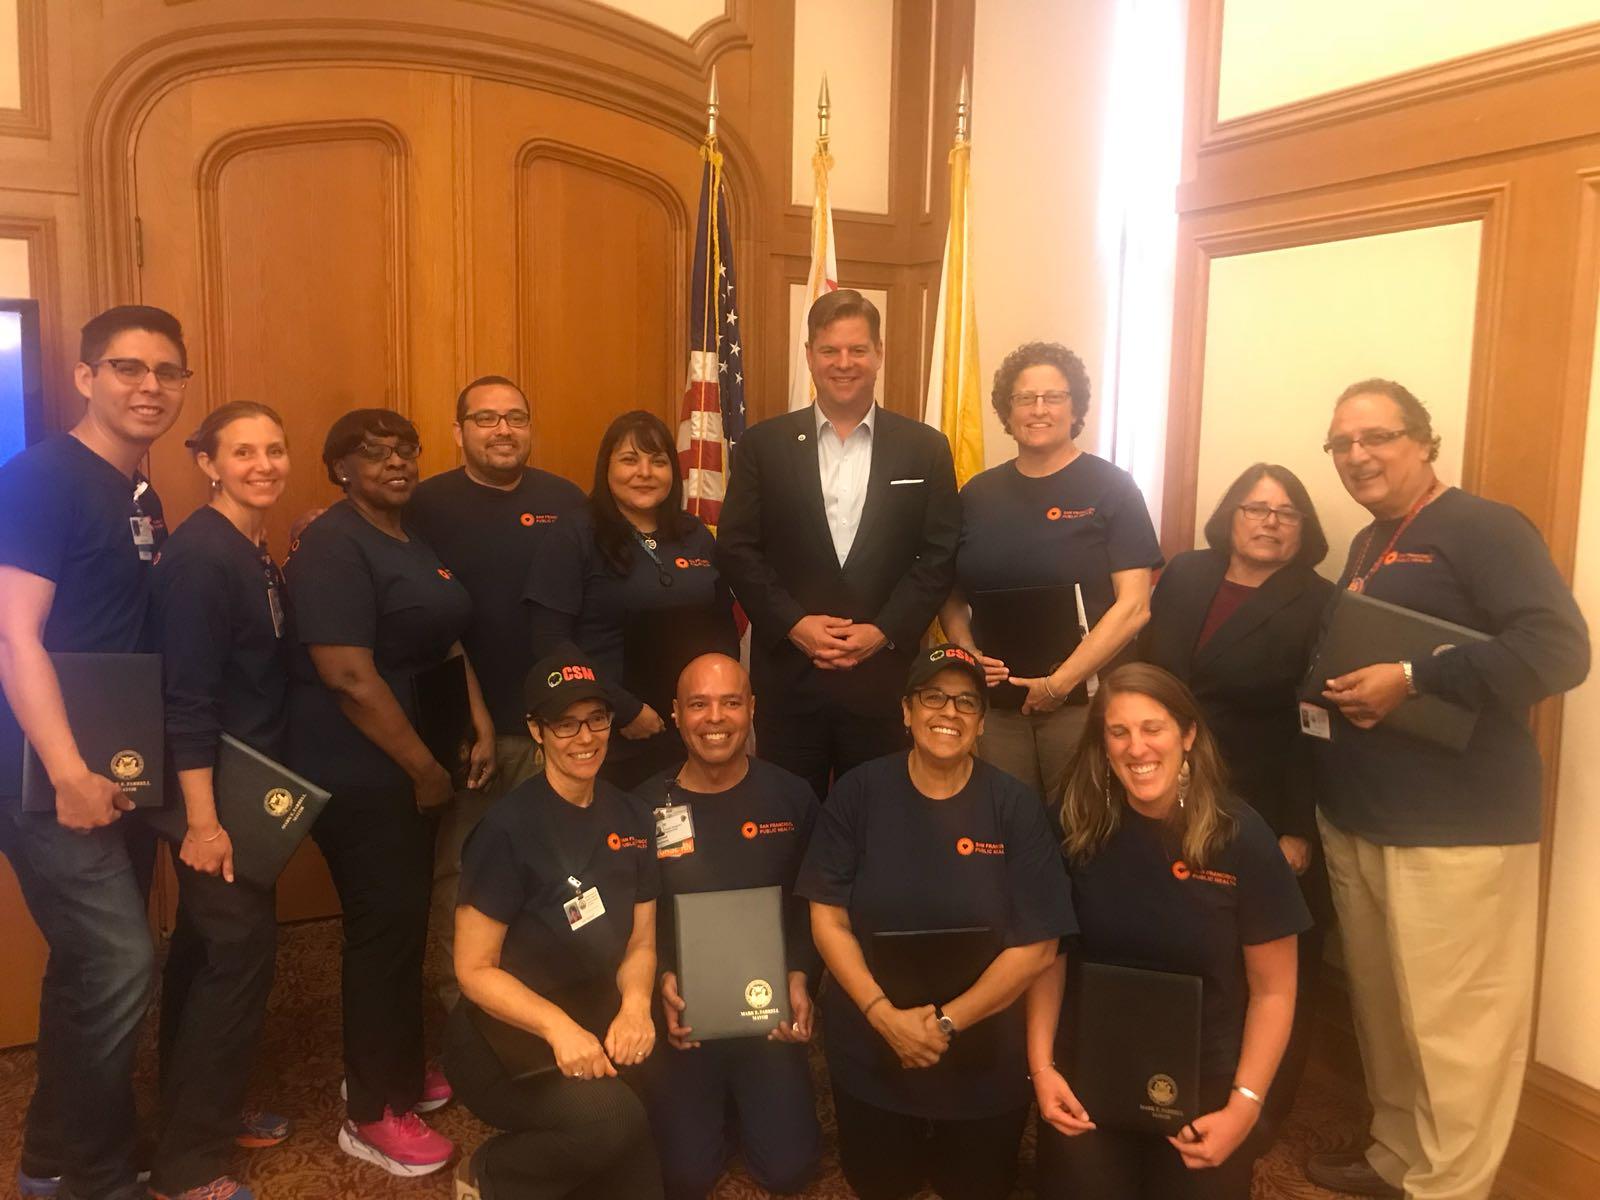 Mayor Farrell DPH staff group photo